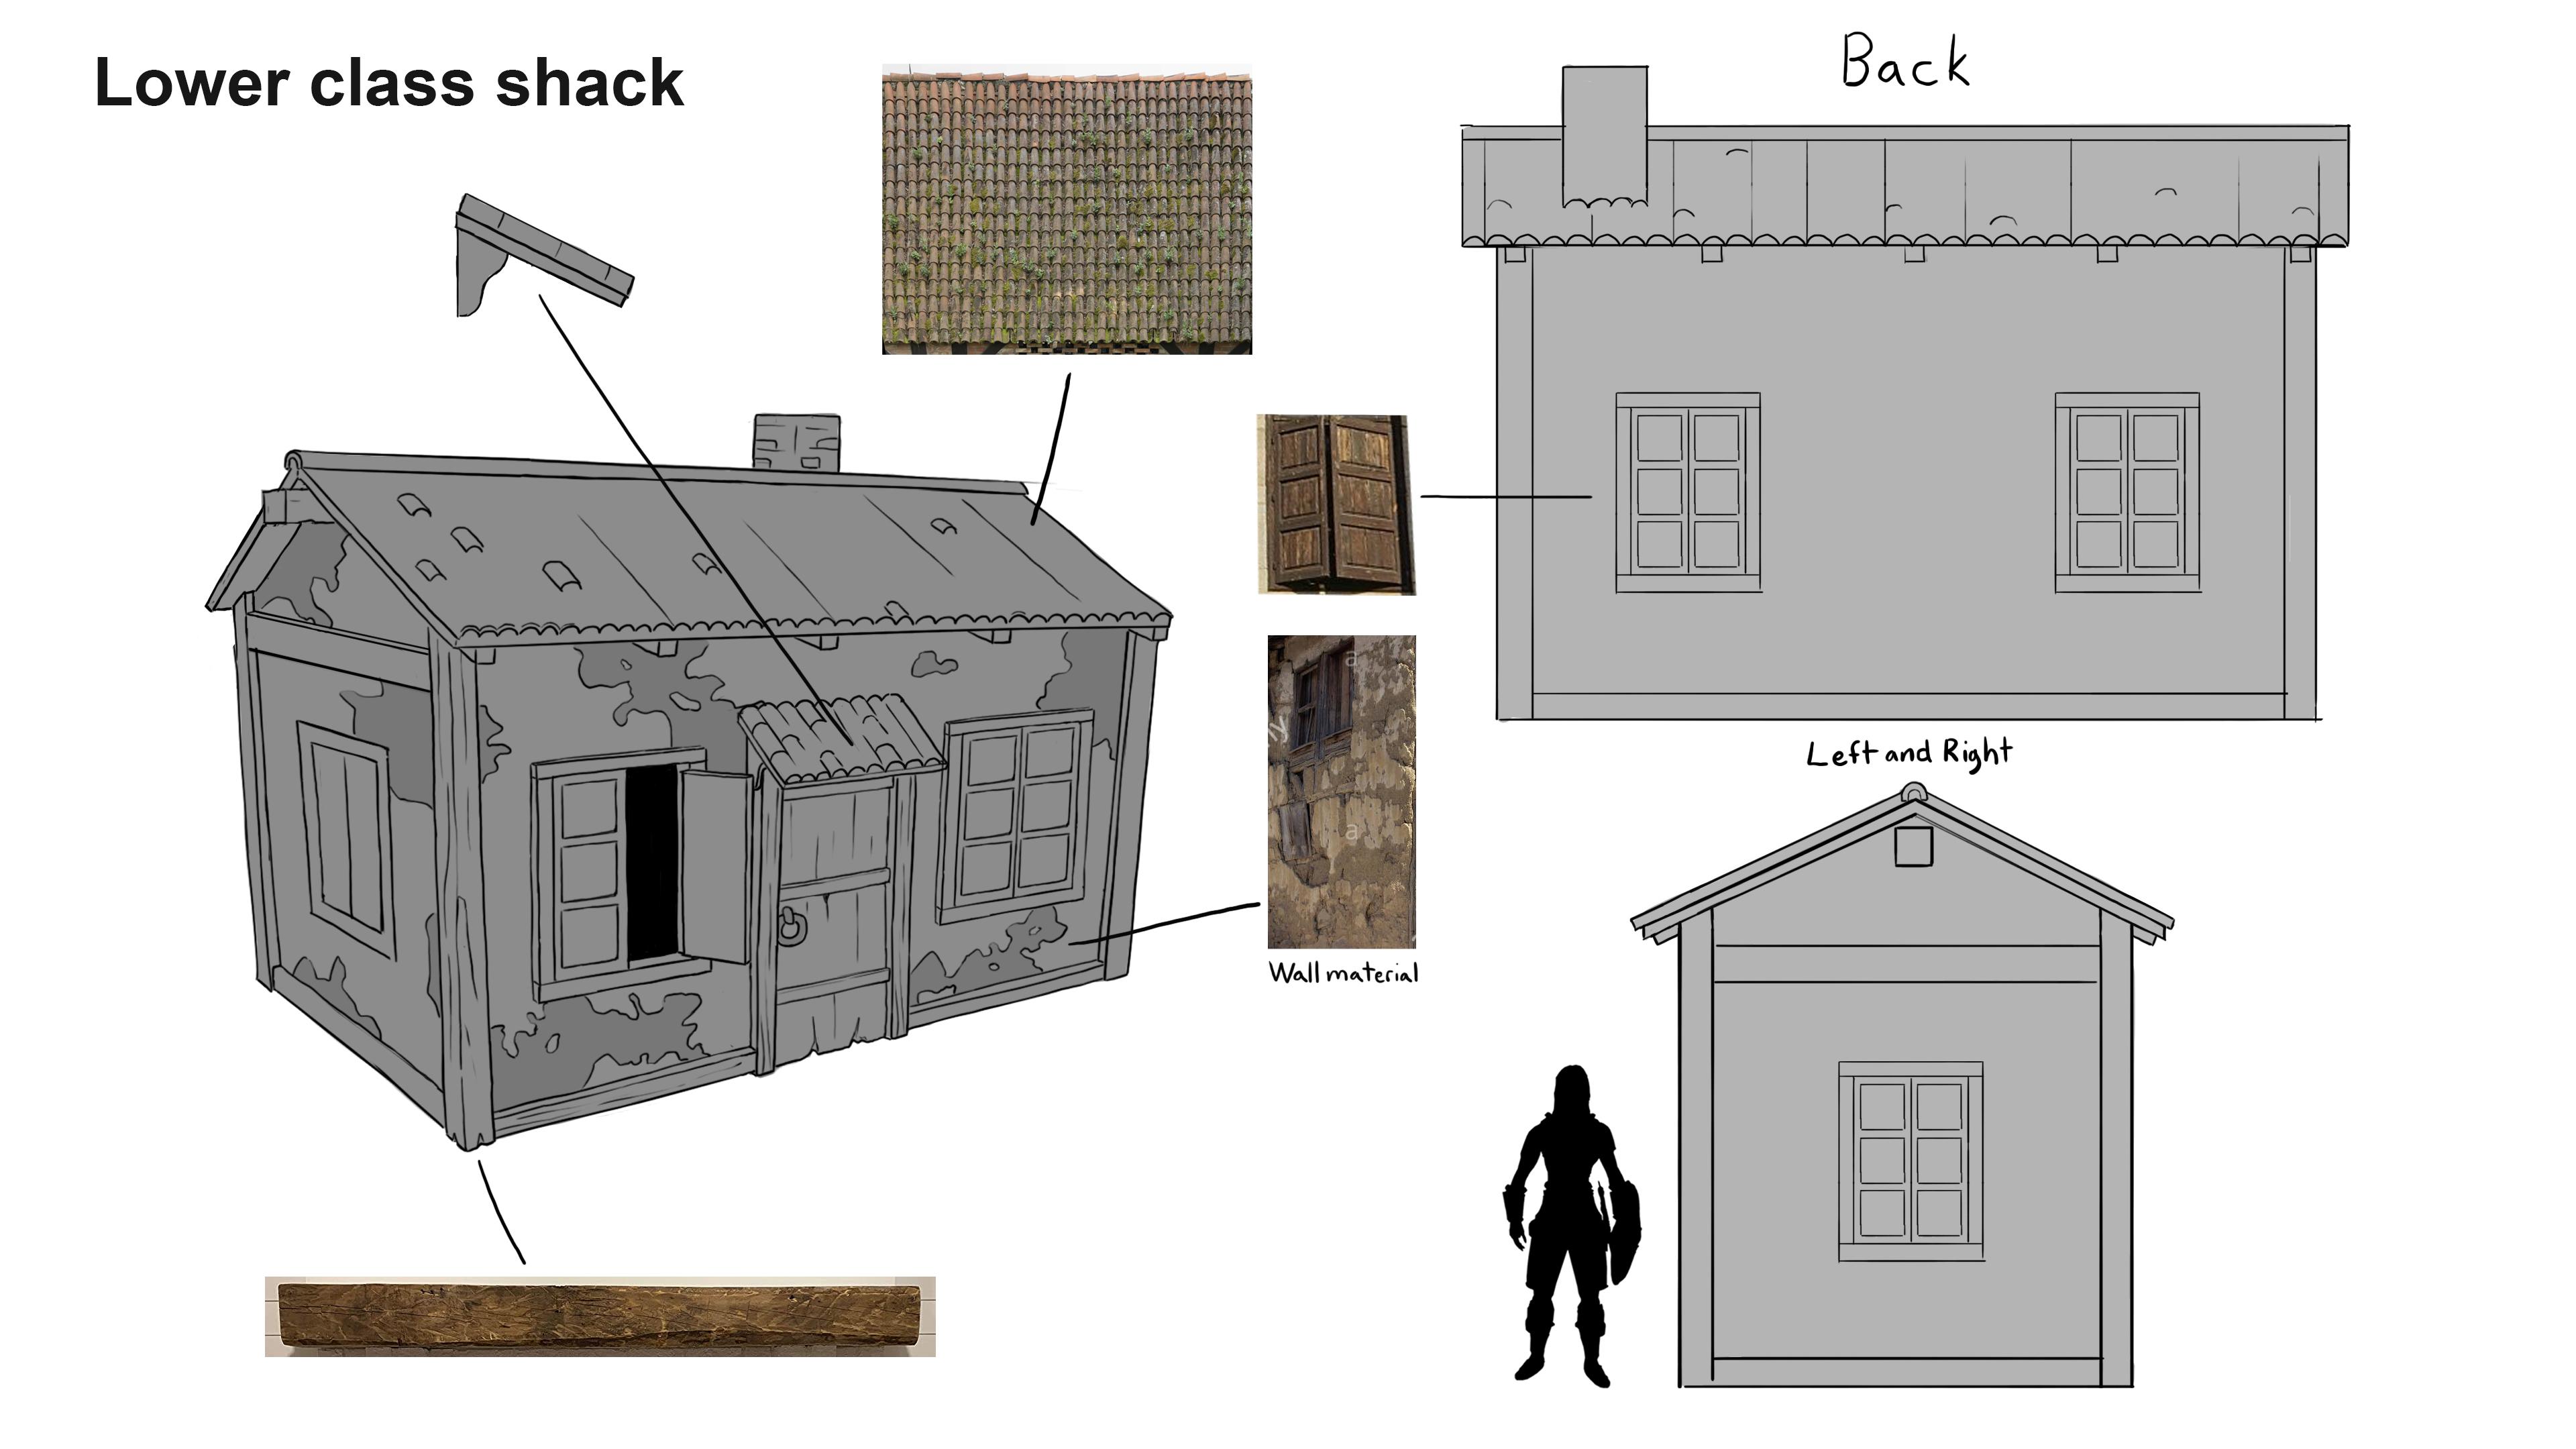 Wardensbay simple shack 1